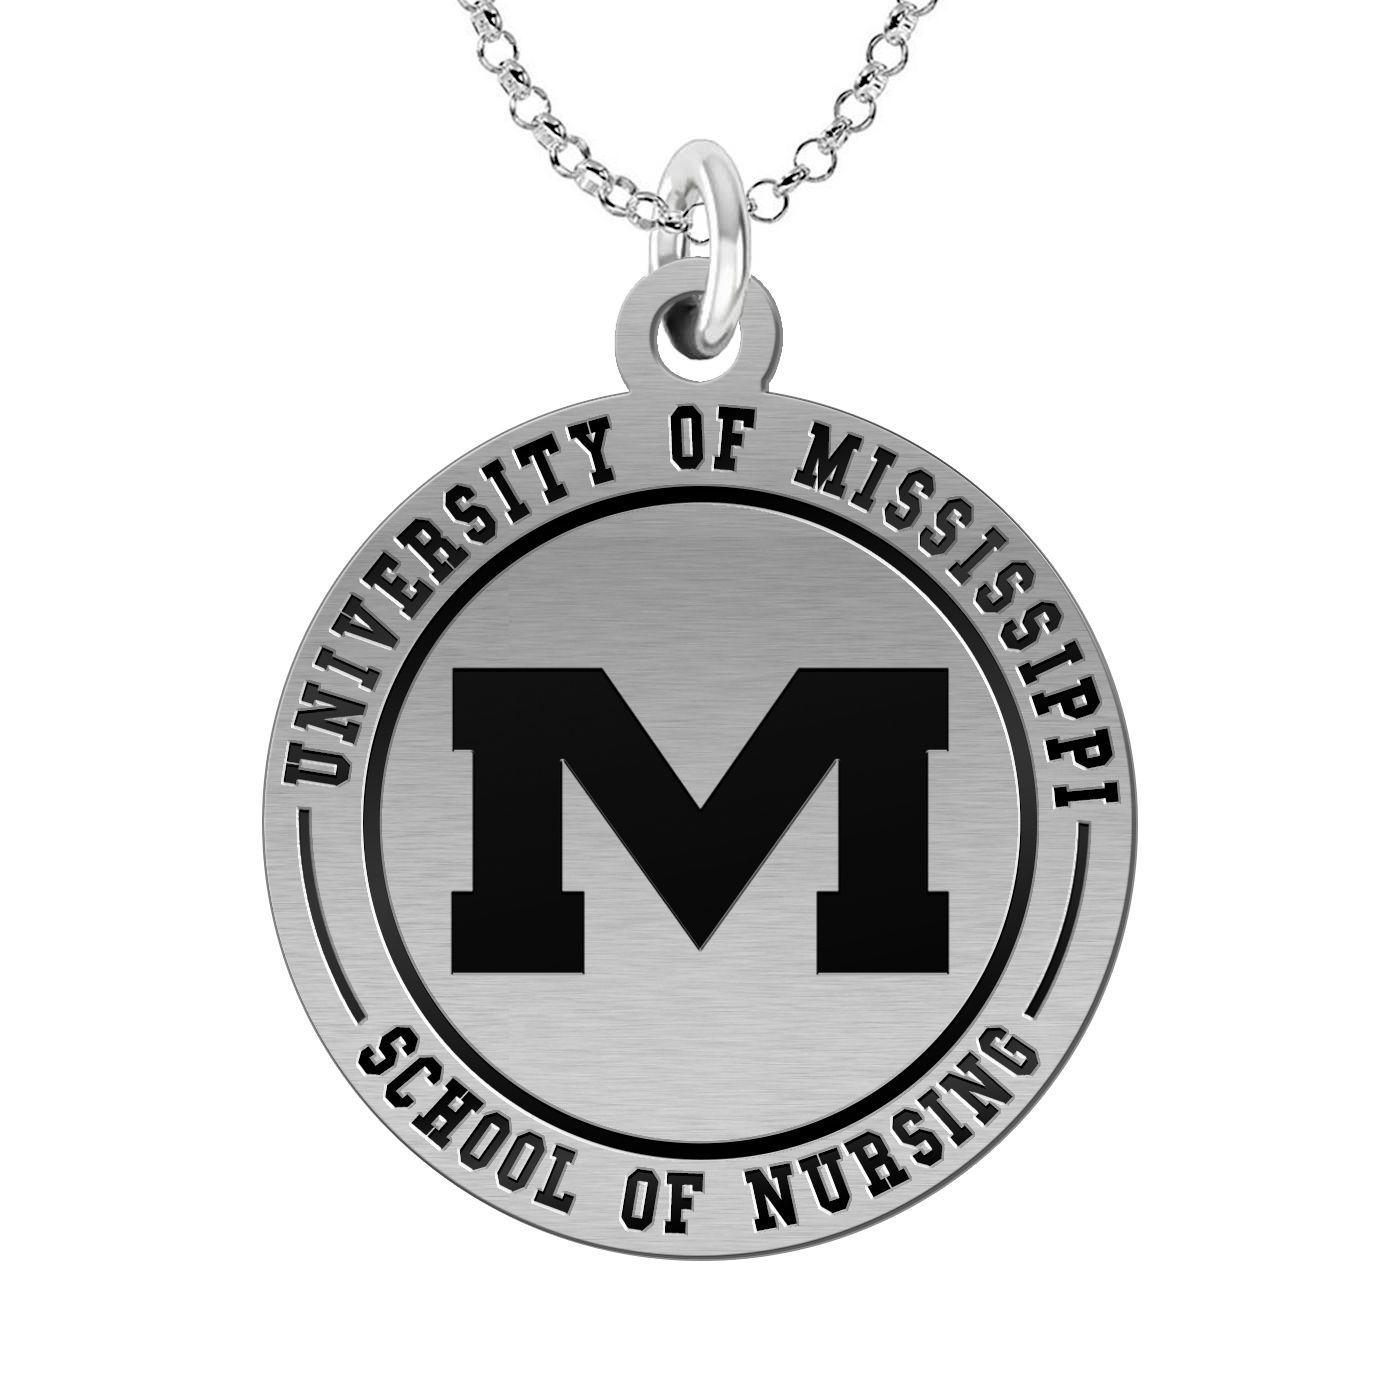 University of Mississippi School of Nursing Charm ; Ole